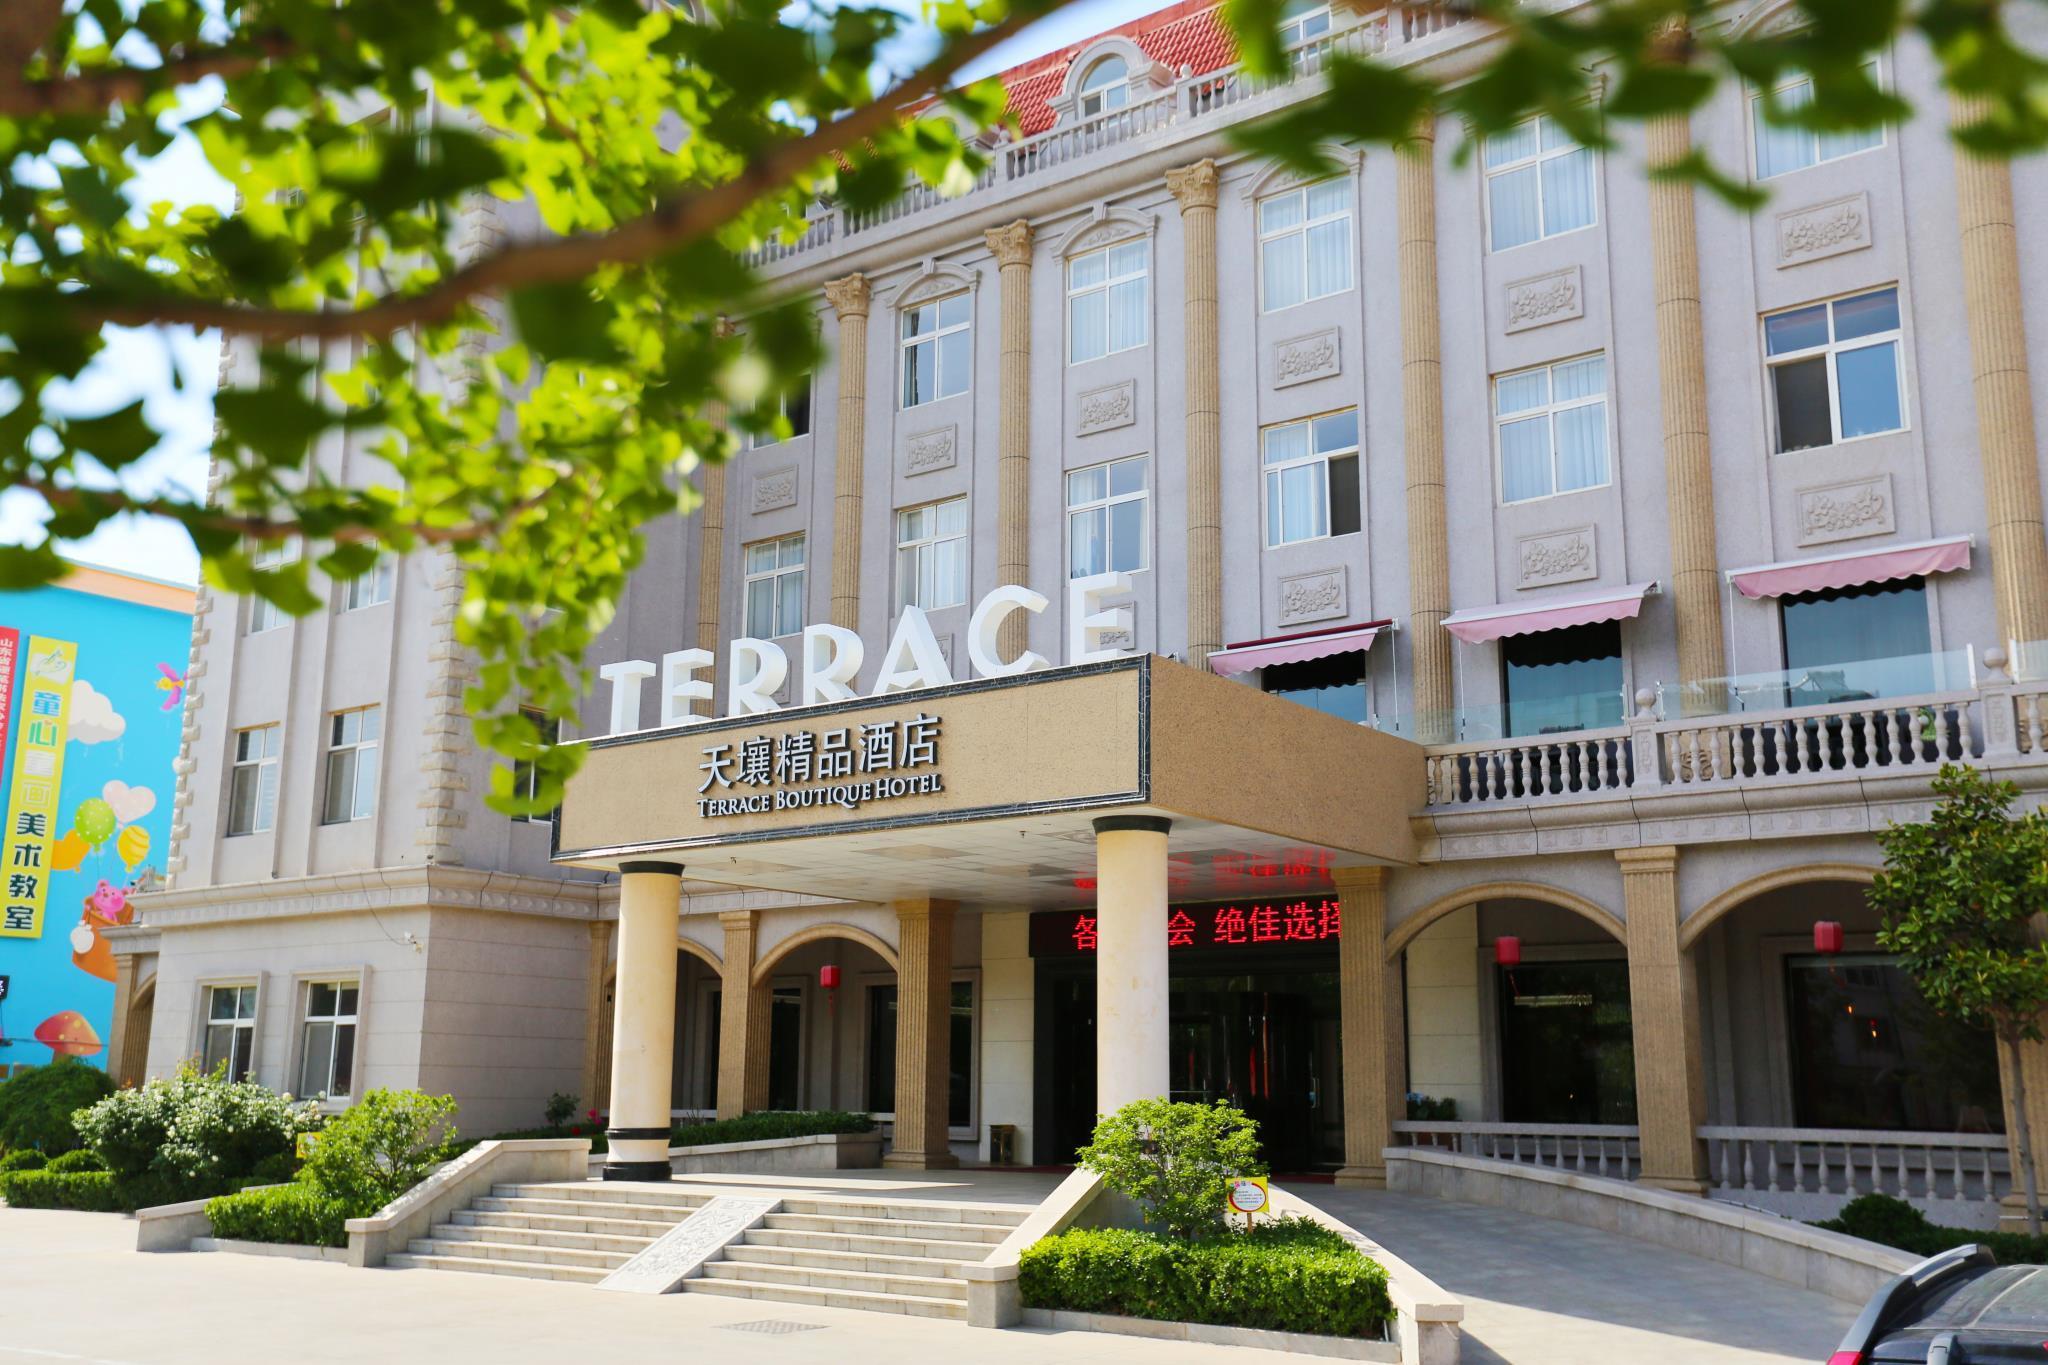 Terrace Boutique Hotel, Qingdao